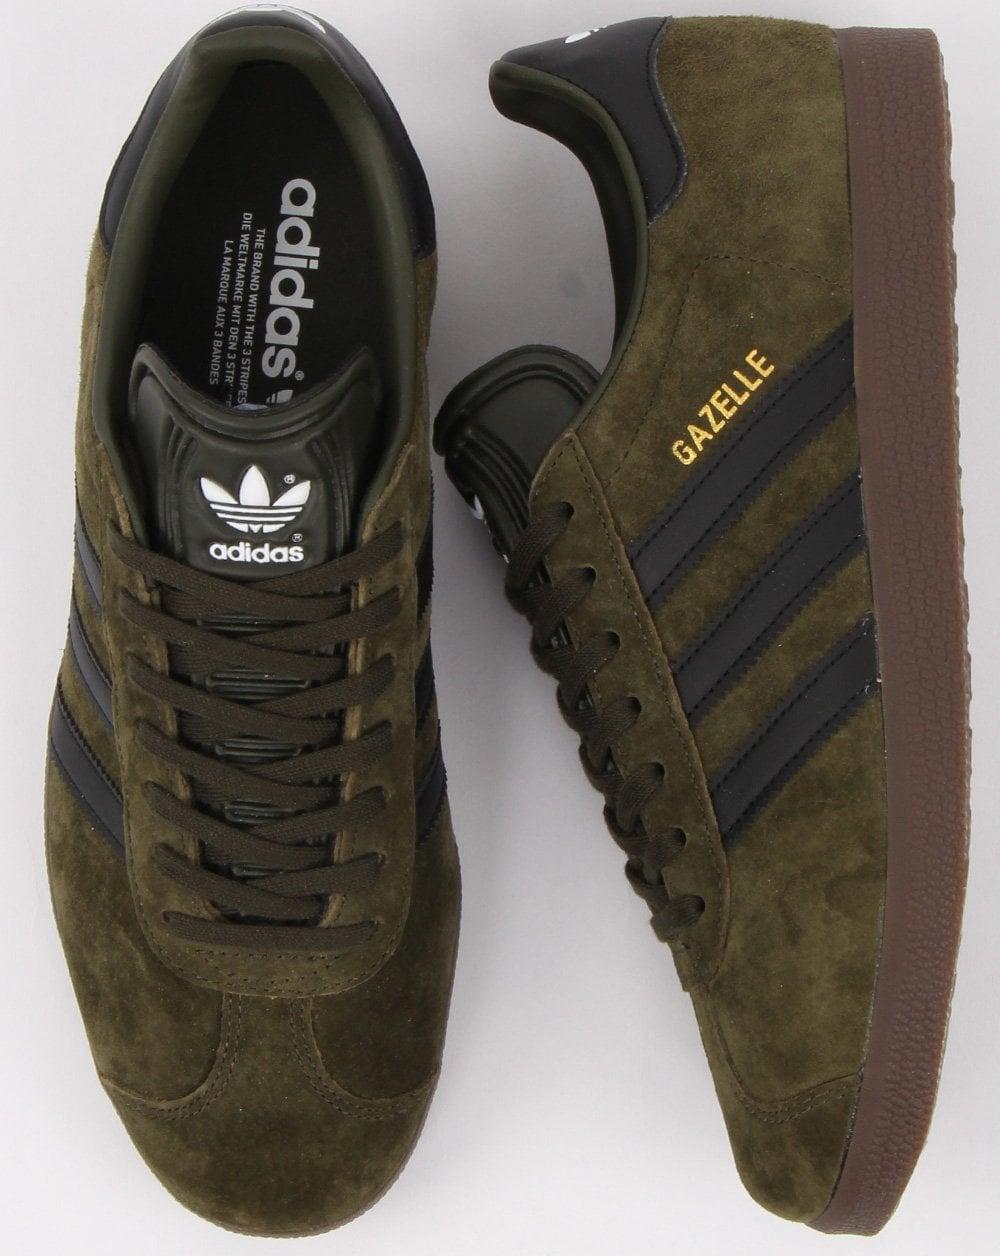 quality design 79b3c e1049 Adidas Gazelle Trainers Night Olive   Black gum